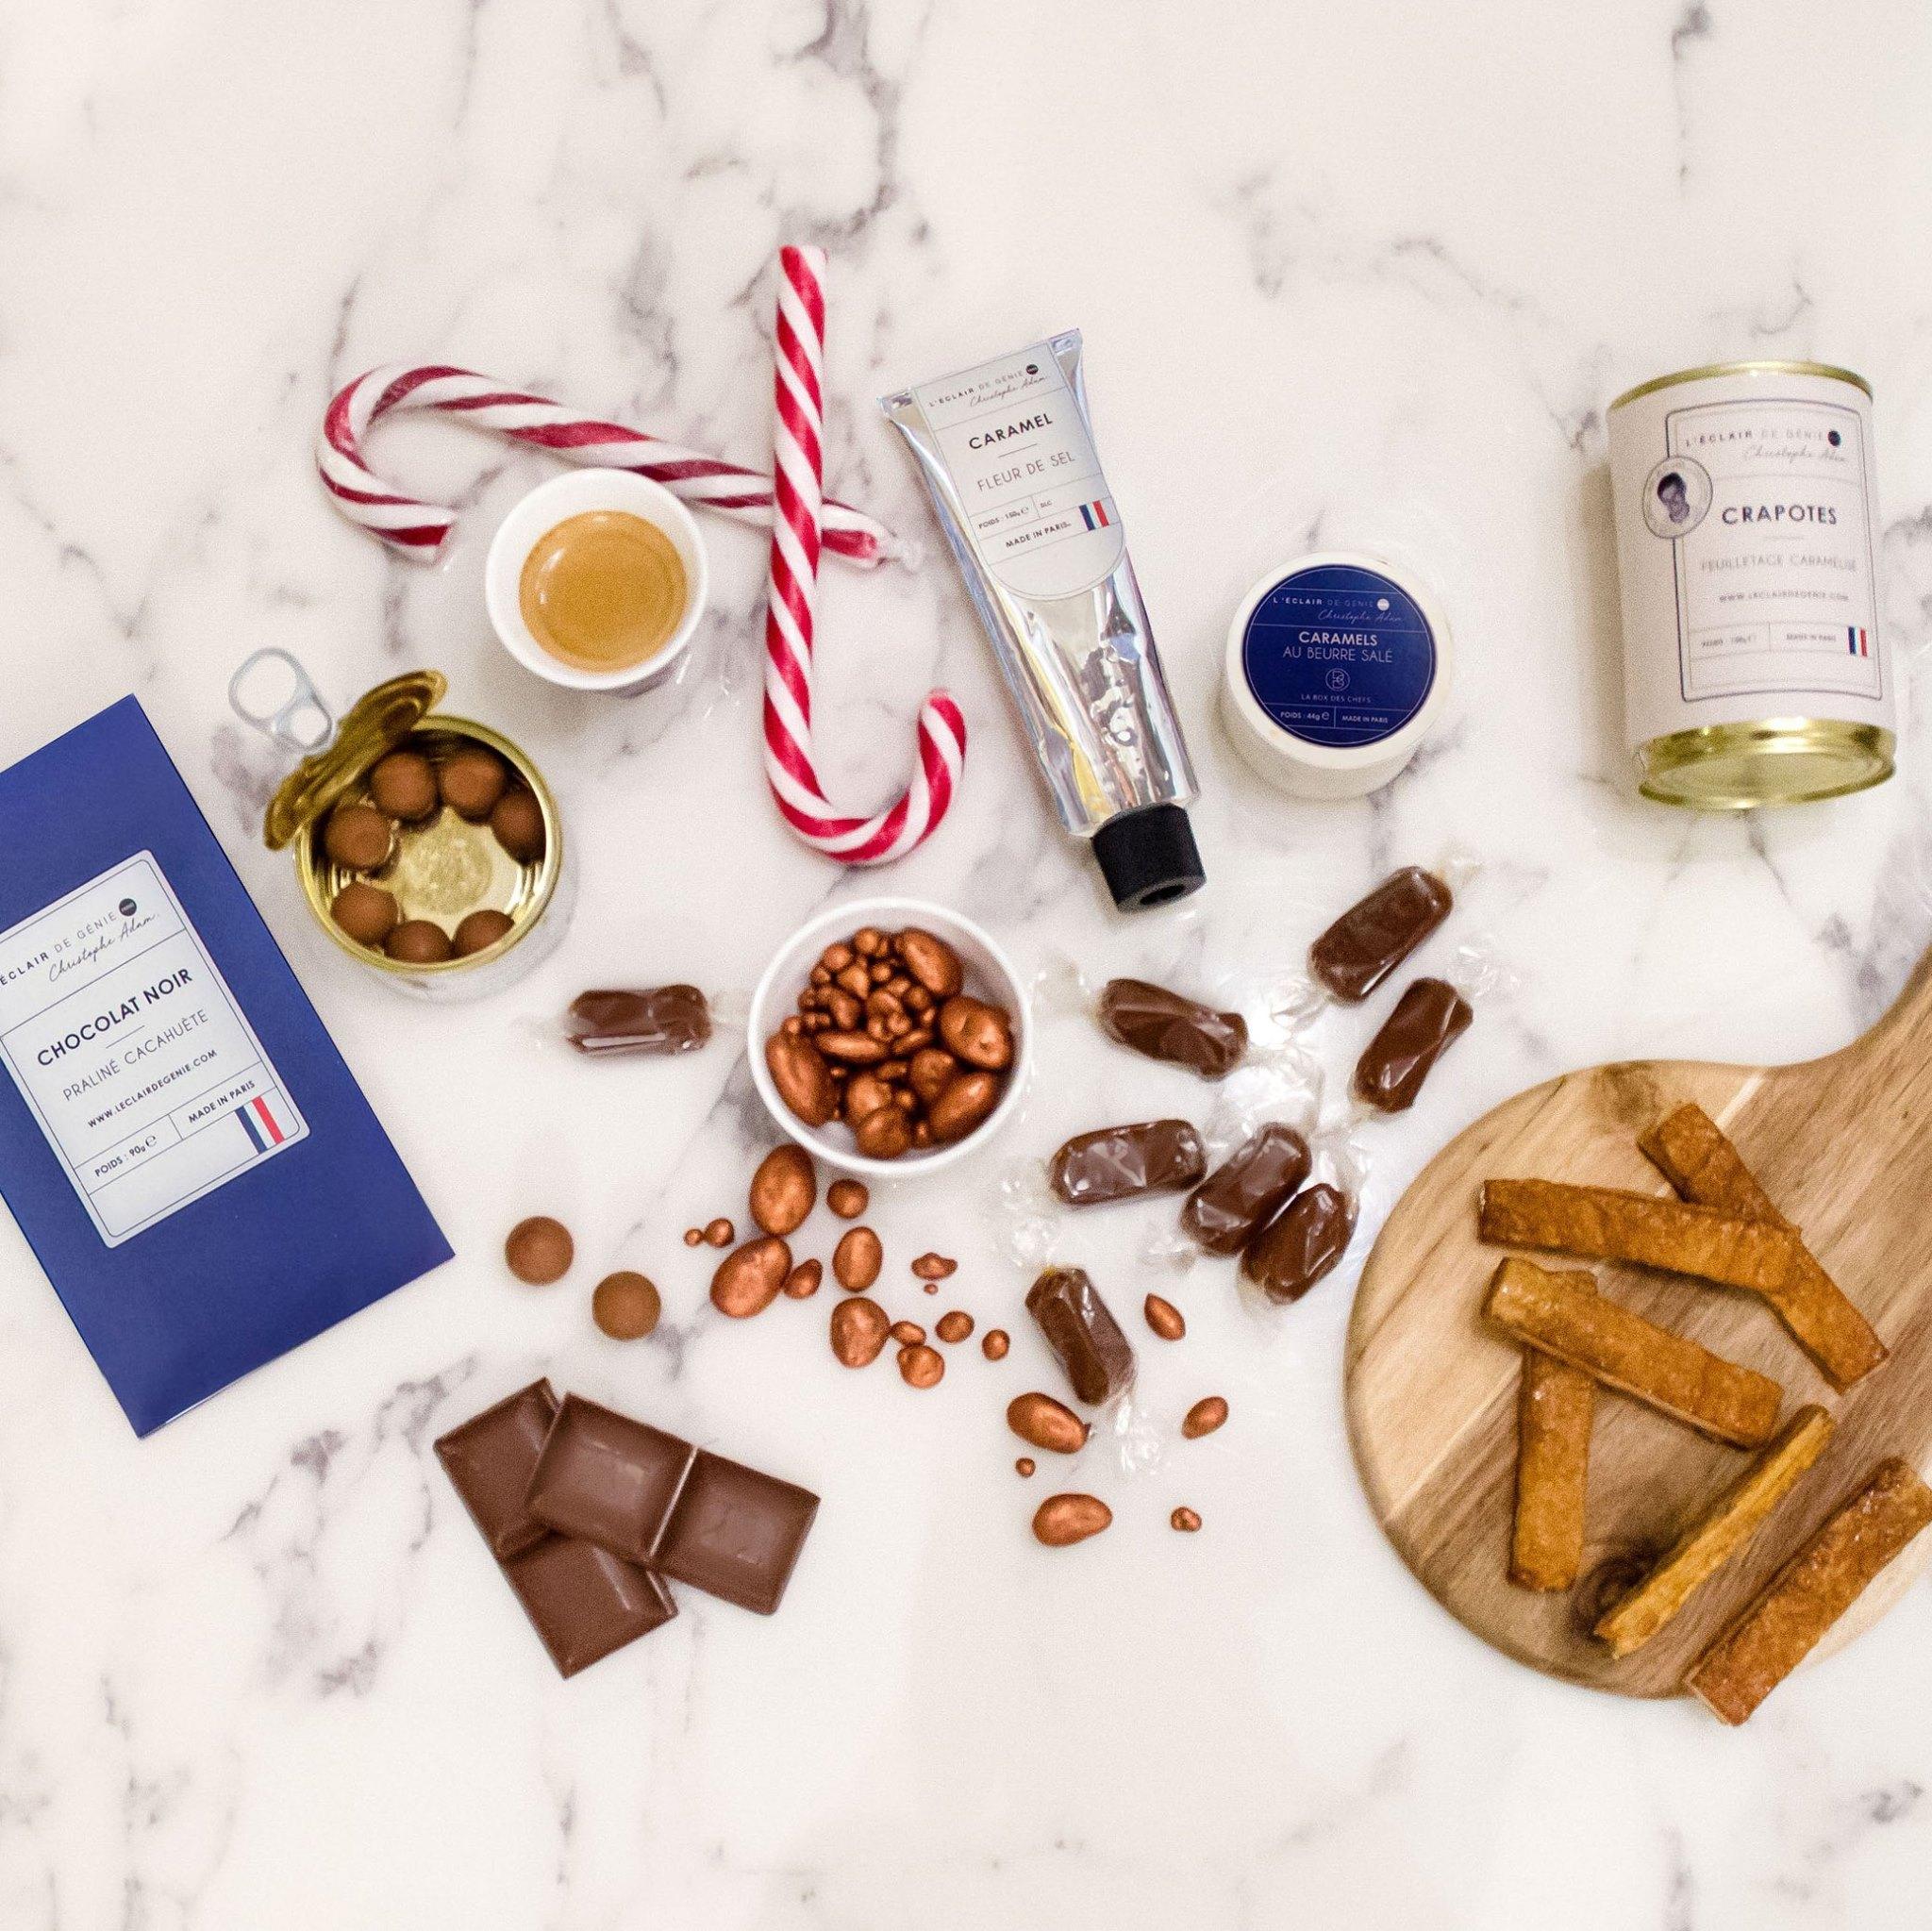 la-box-des-chefs-chocolat-Christophe-Adam